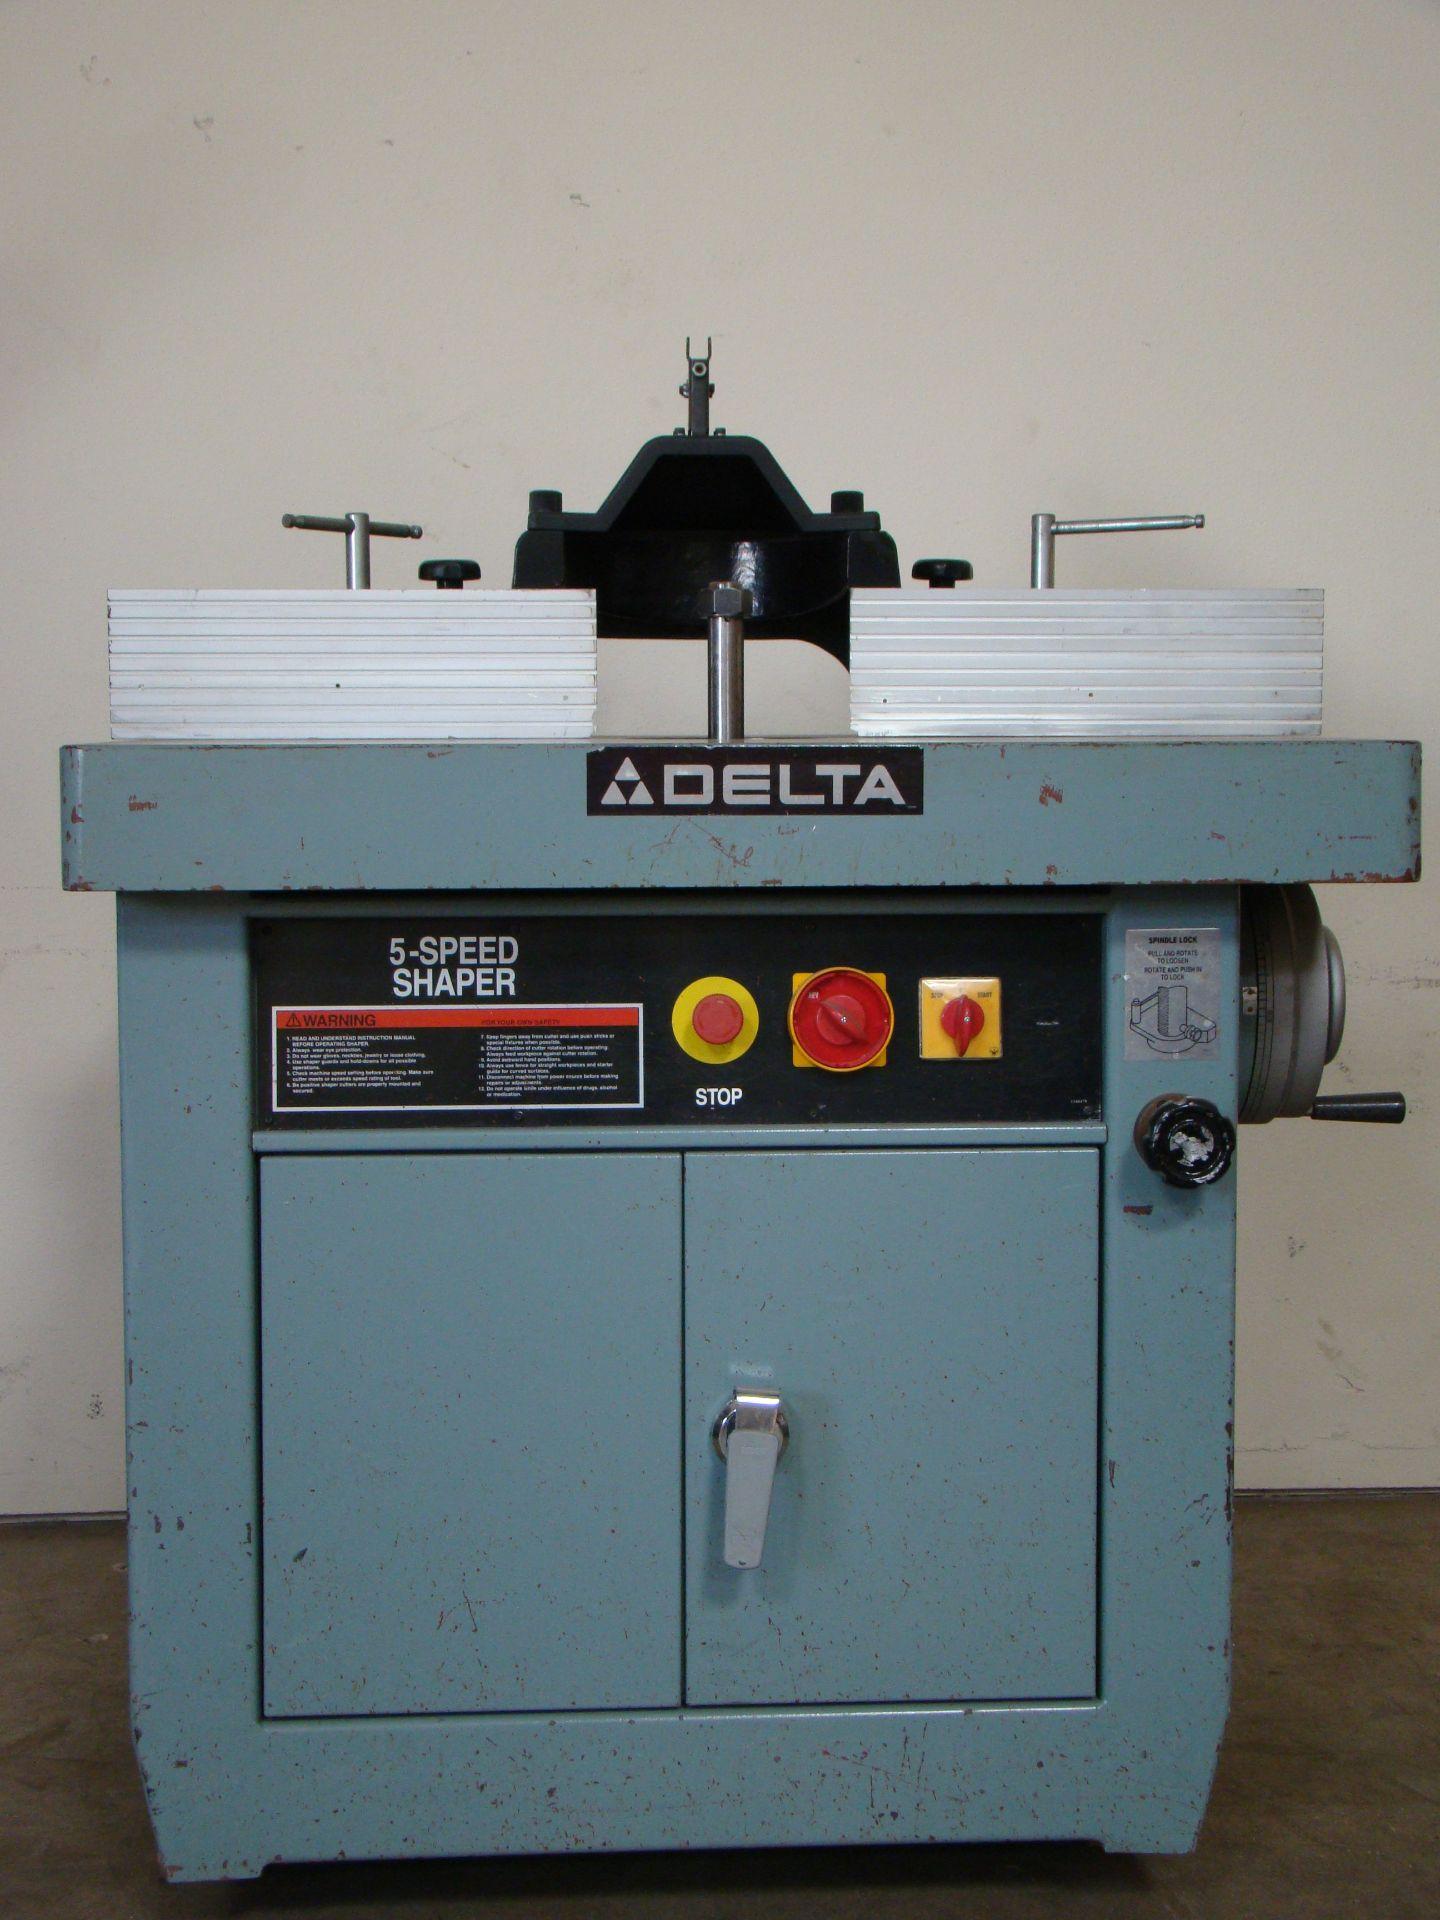 "Lot 5 - Delta Wood Shaper 43-791 5 speed 1-1/4"" Spindle 7.5 HP 200-220/440 Volt 3PH"